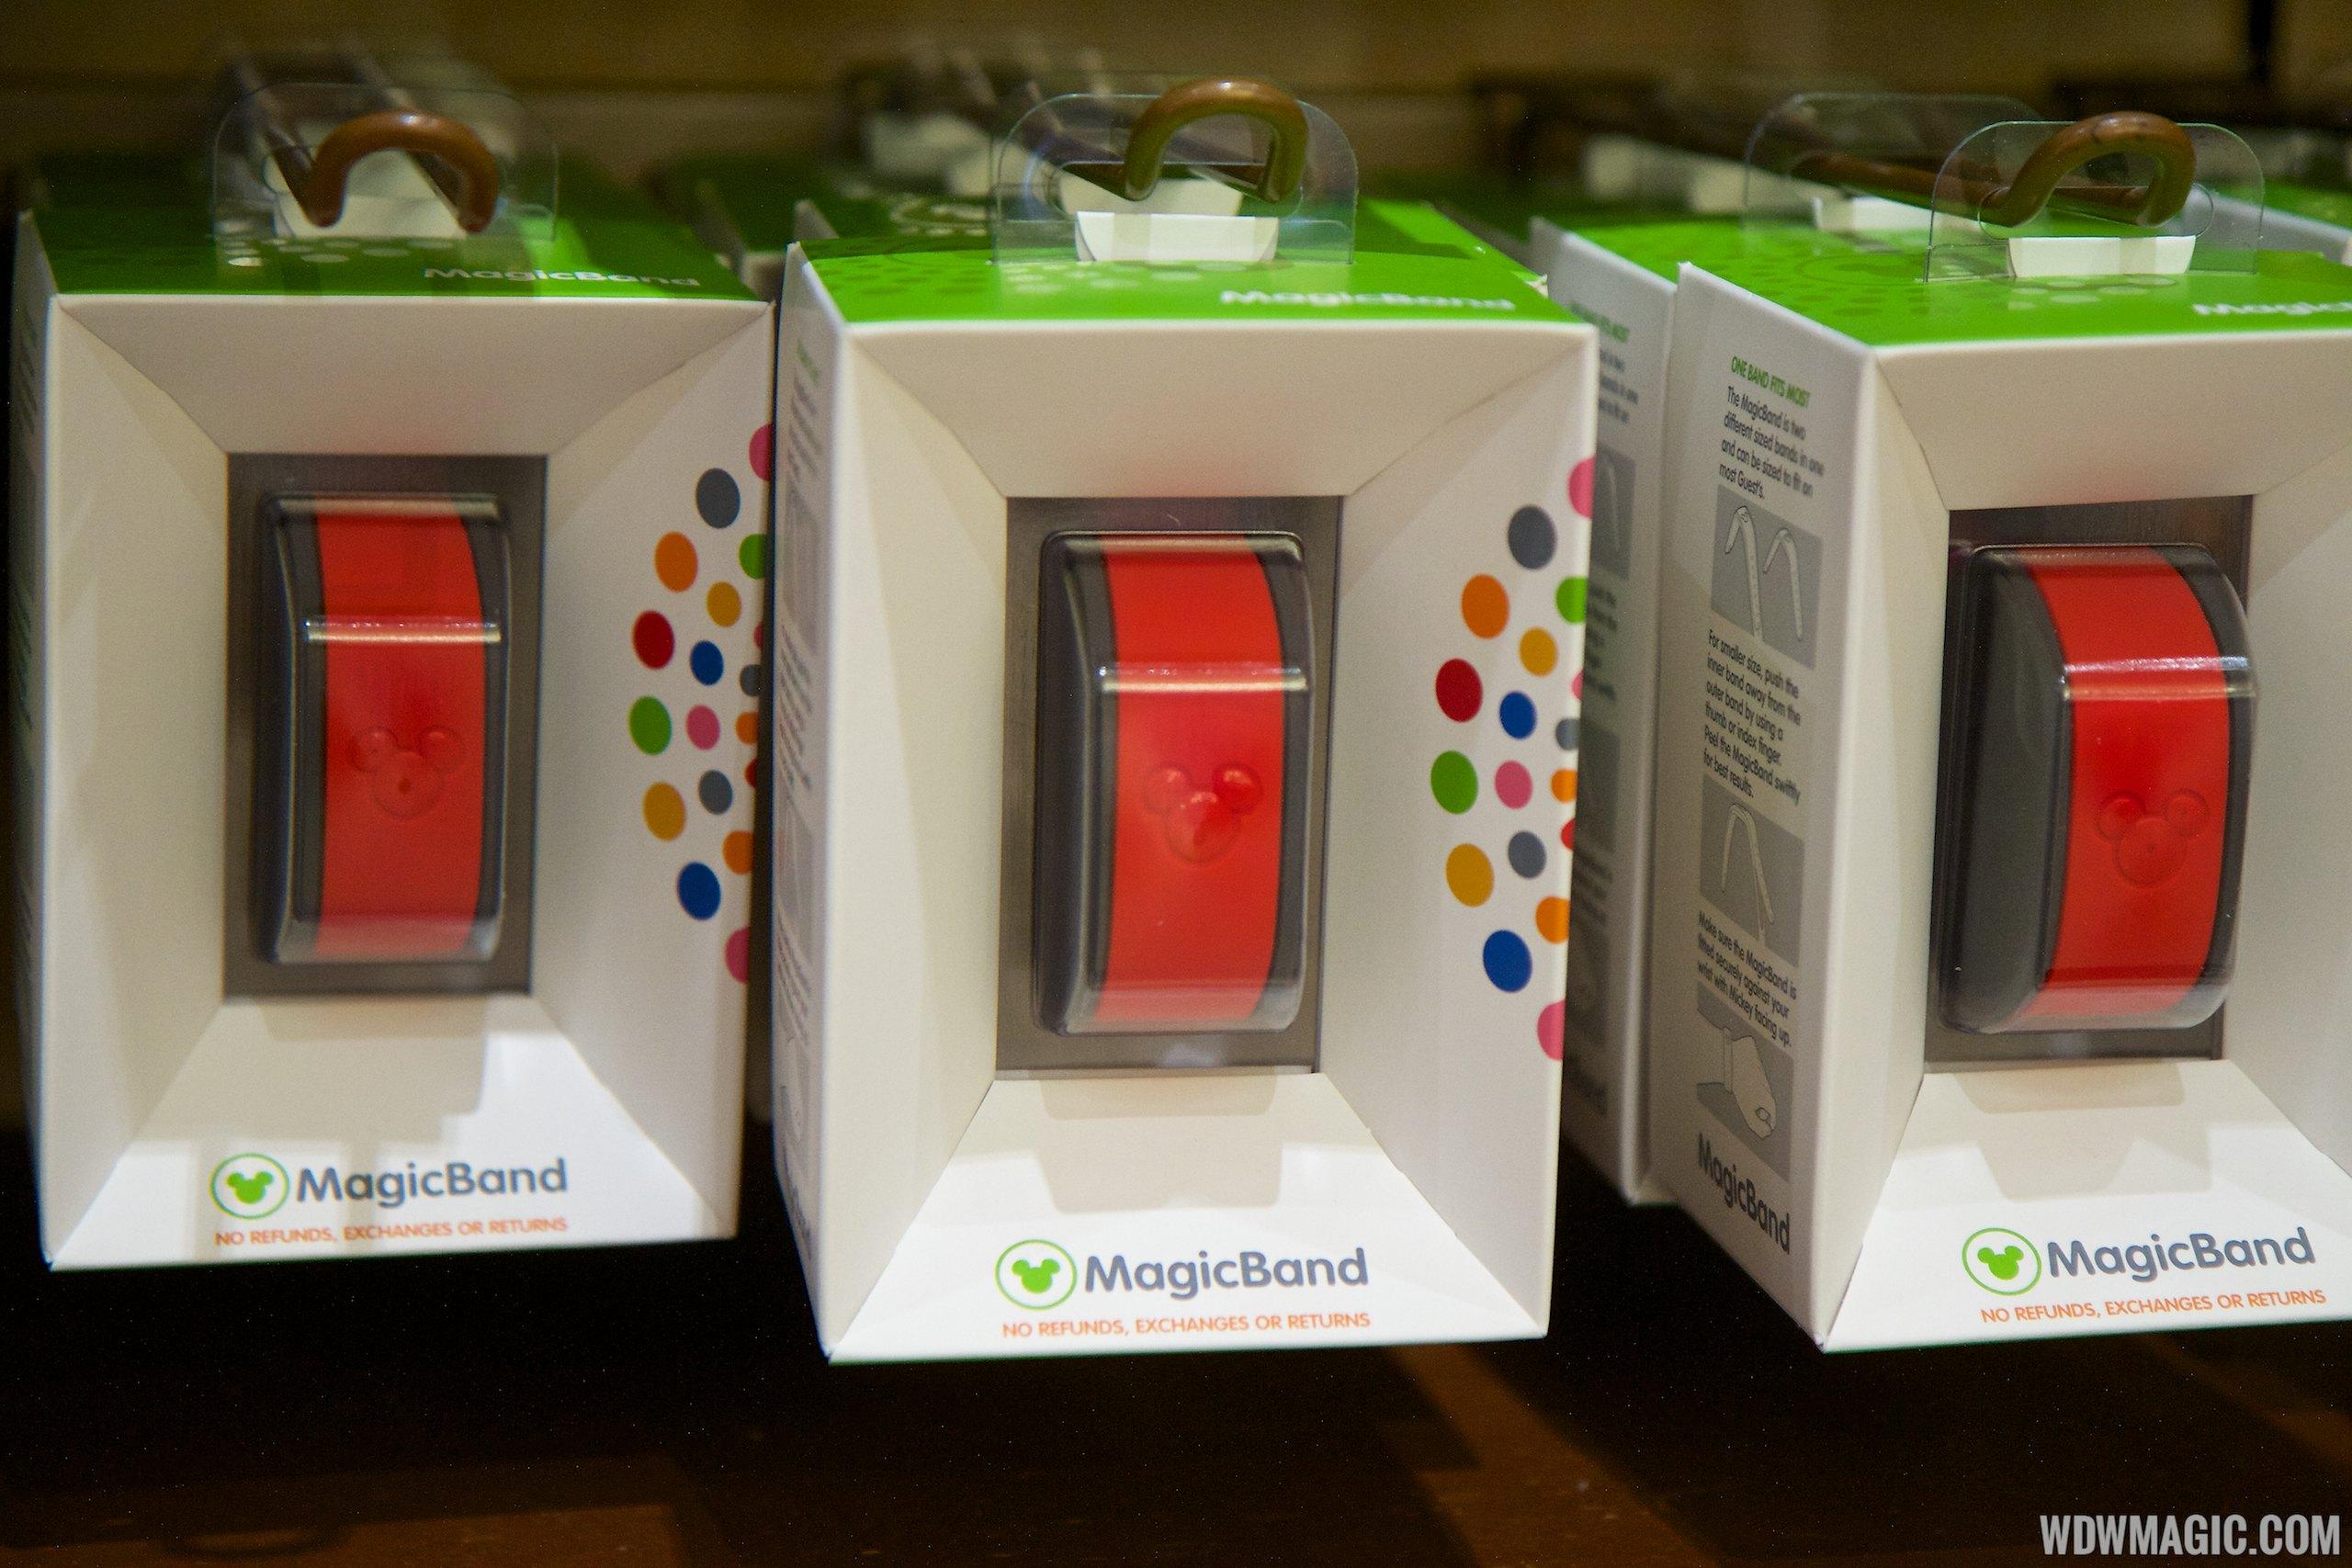 MagicBand retail box